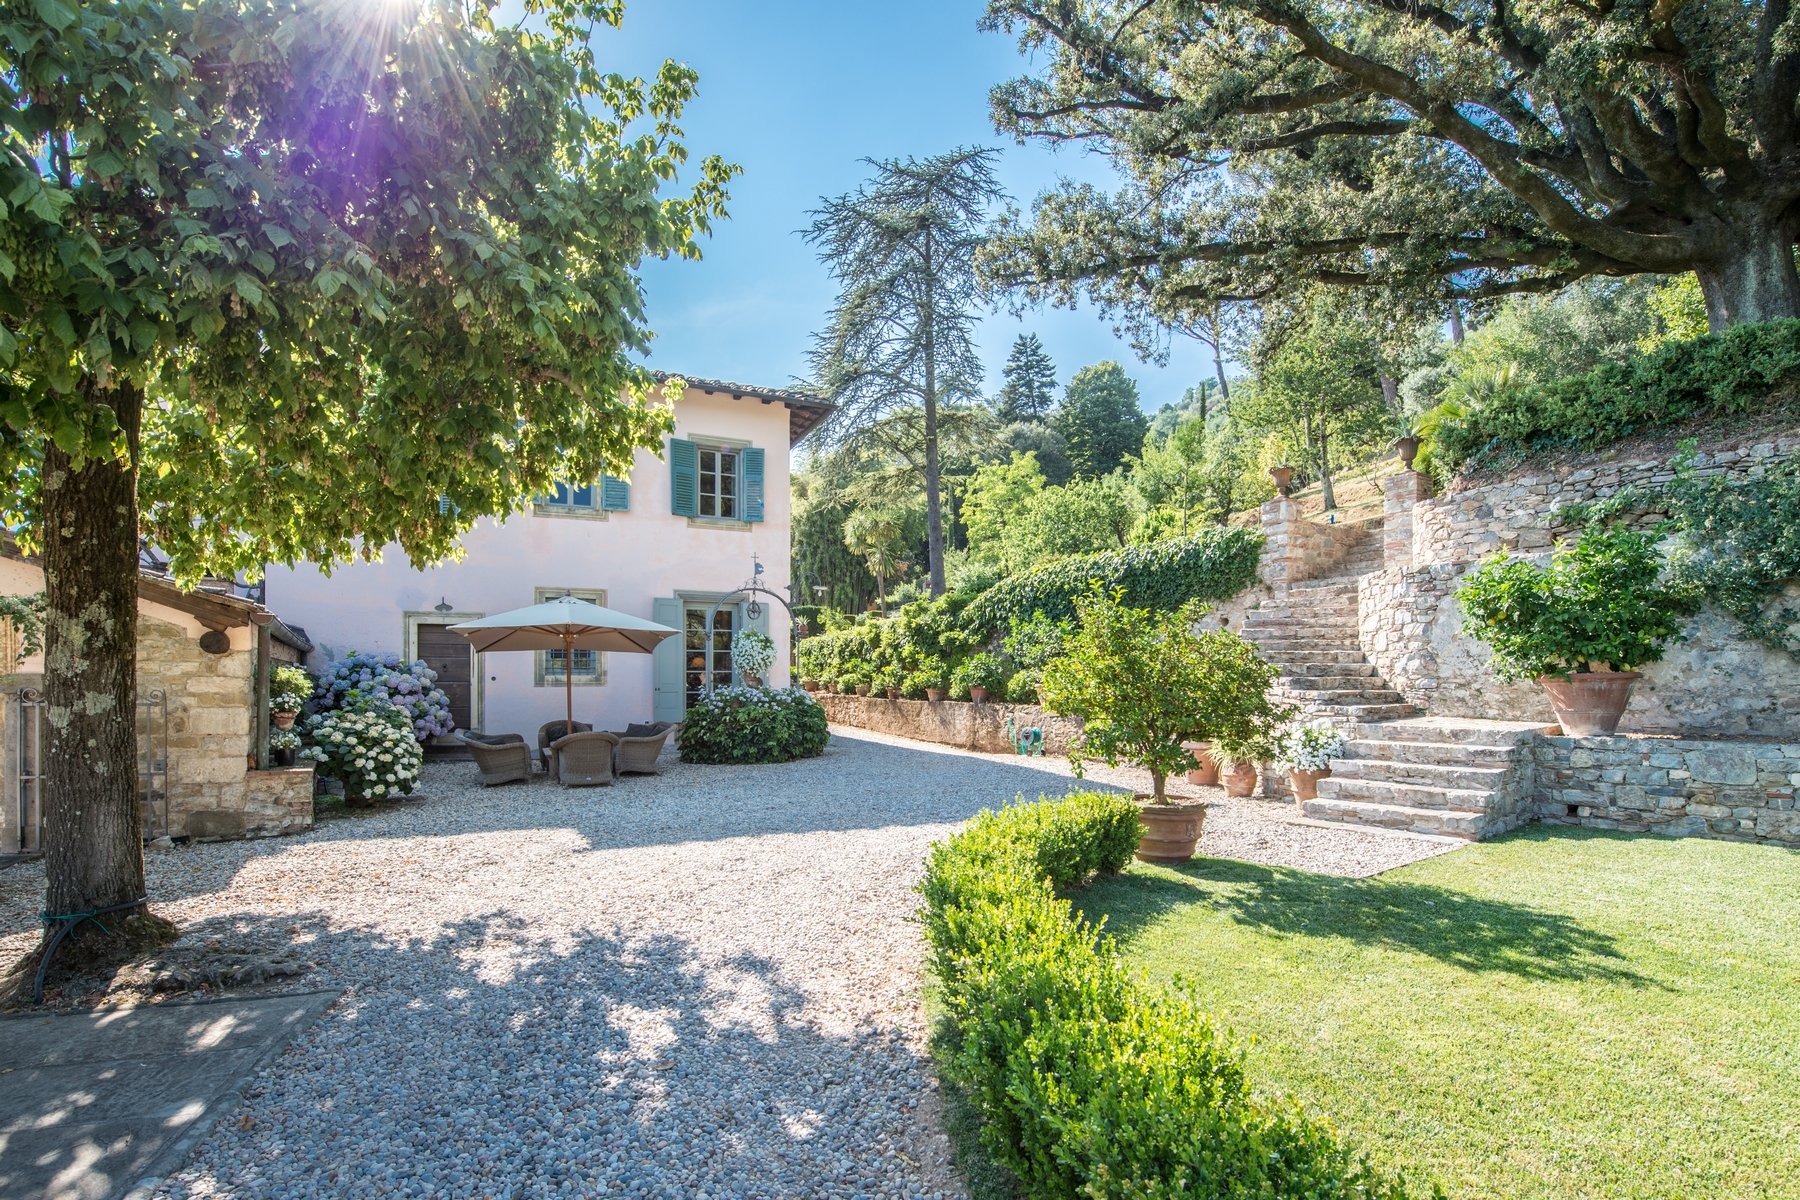 Villa in Vendita a Lucca: 5 locali, 2500 mq - Foto 3